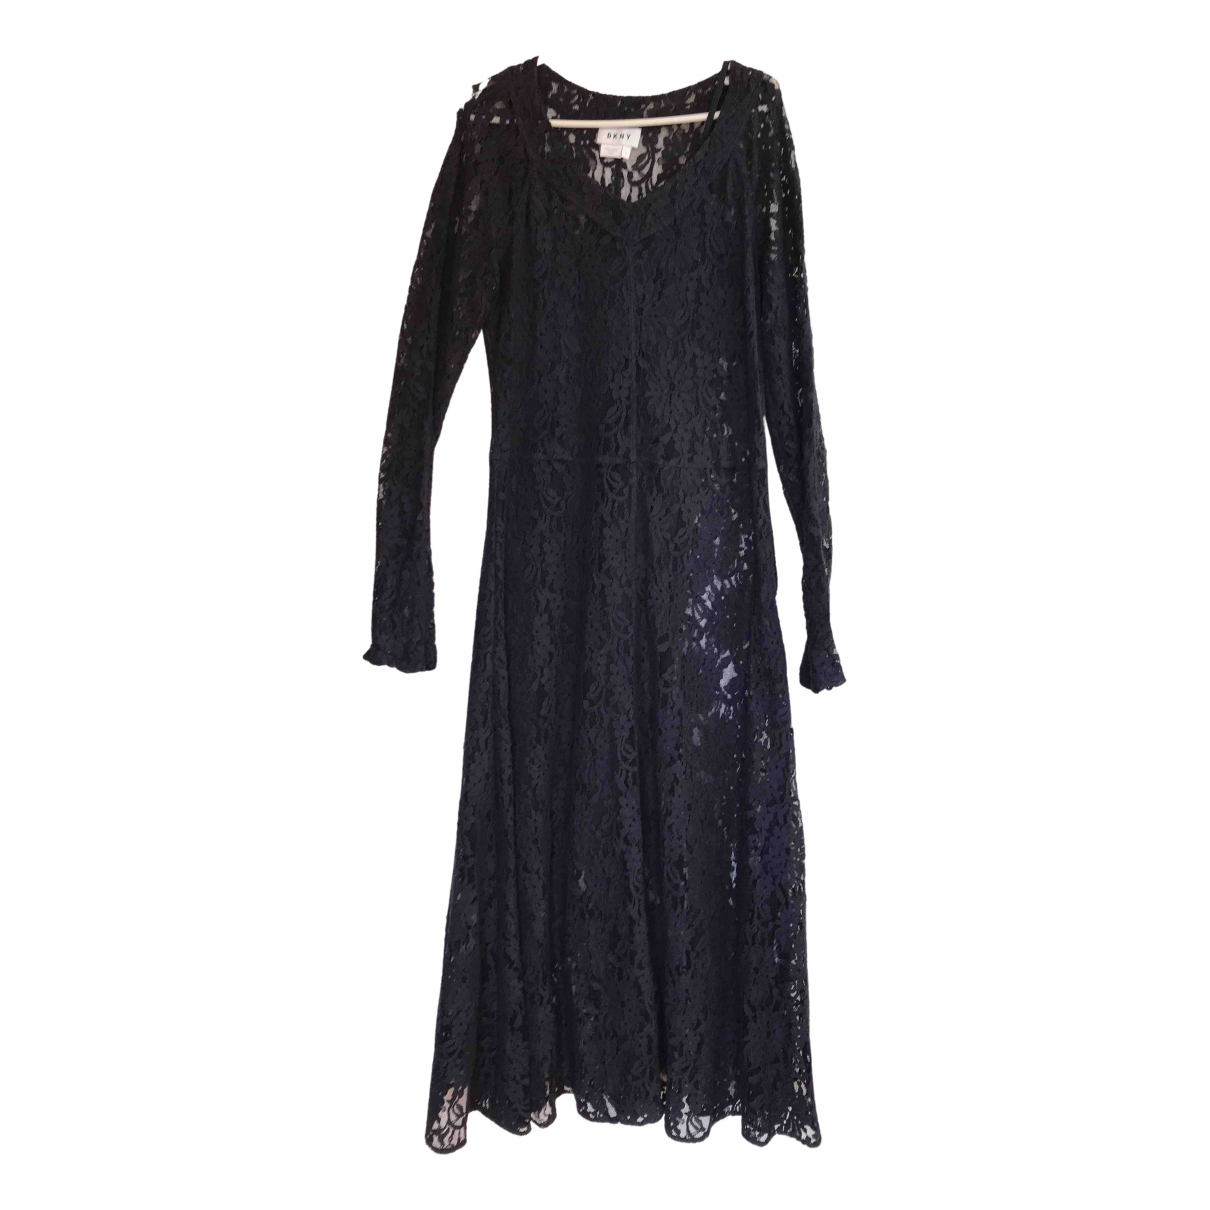 Dkny \N Blue Lace dress for Women 4 US